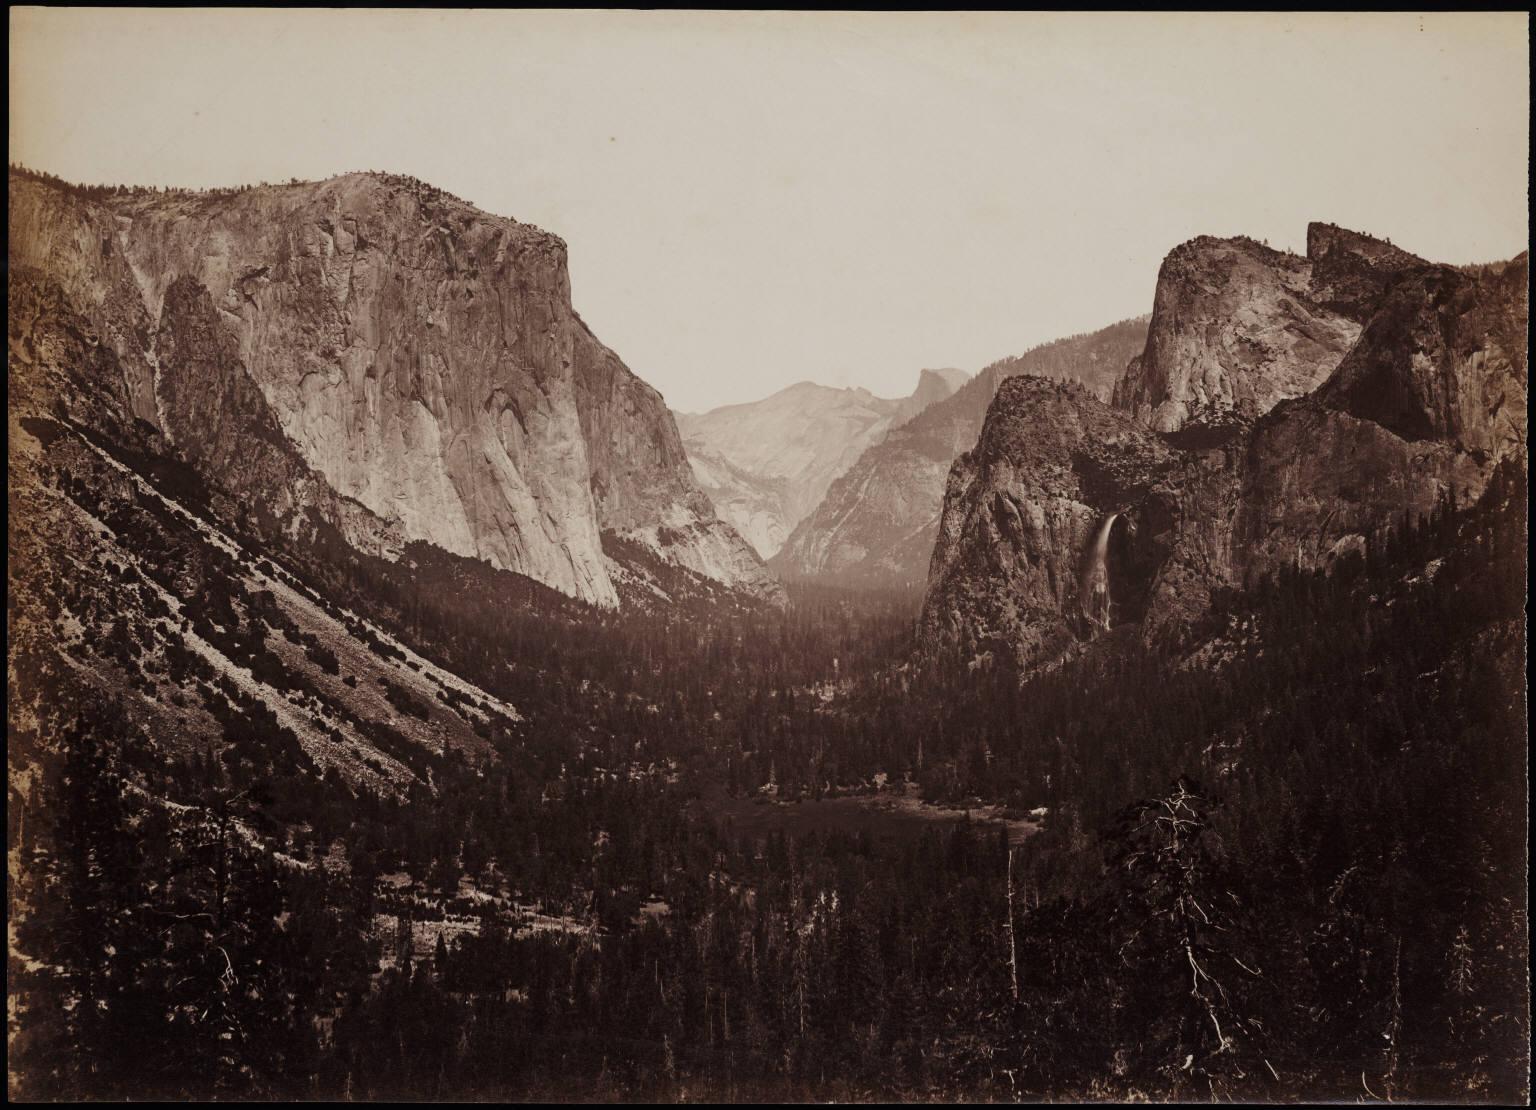 The_Yosemite_Valley_From_The_Mariposa_Trail_Yosemite_California_by_Carleton_Watkins.jpg